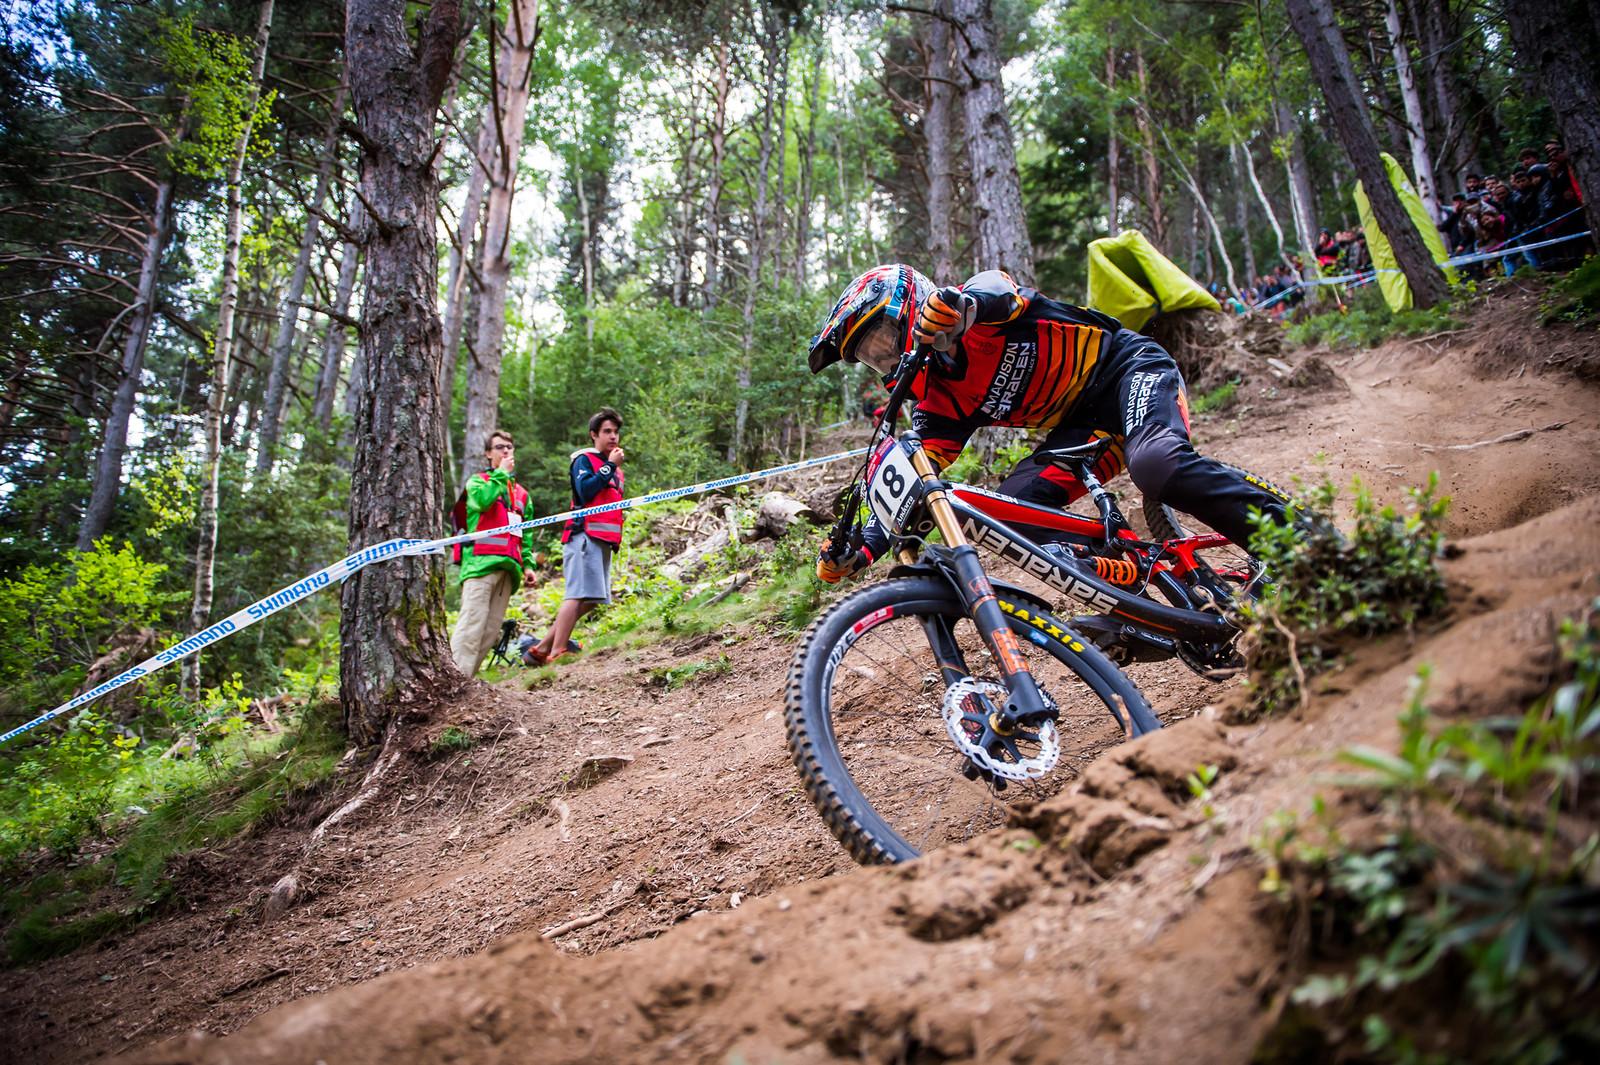 Alex Marin Finals - iceman2058 - Mountain Biking Pictures - Vital MTB